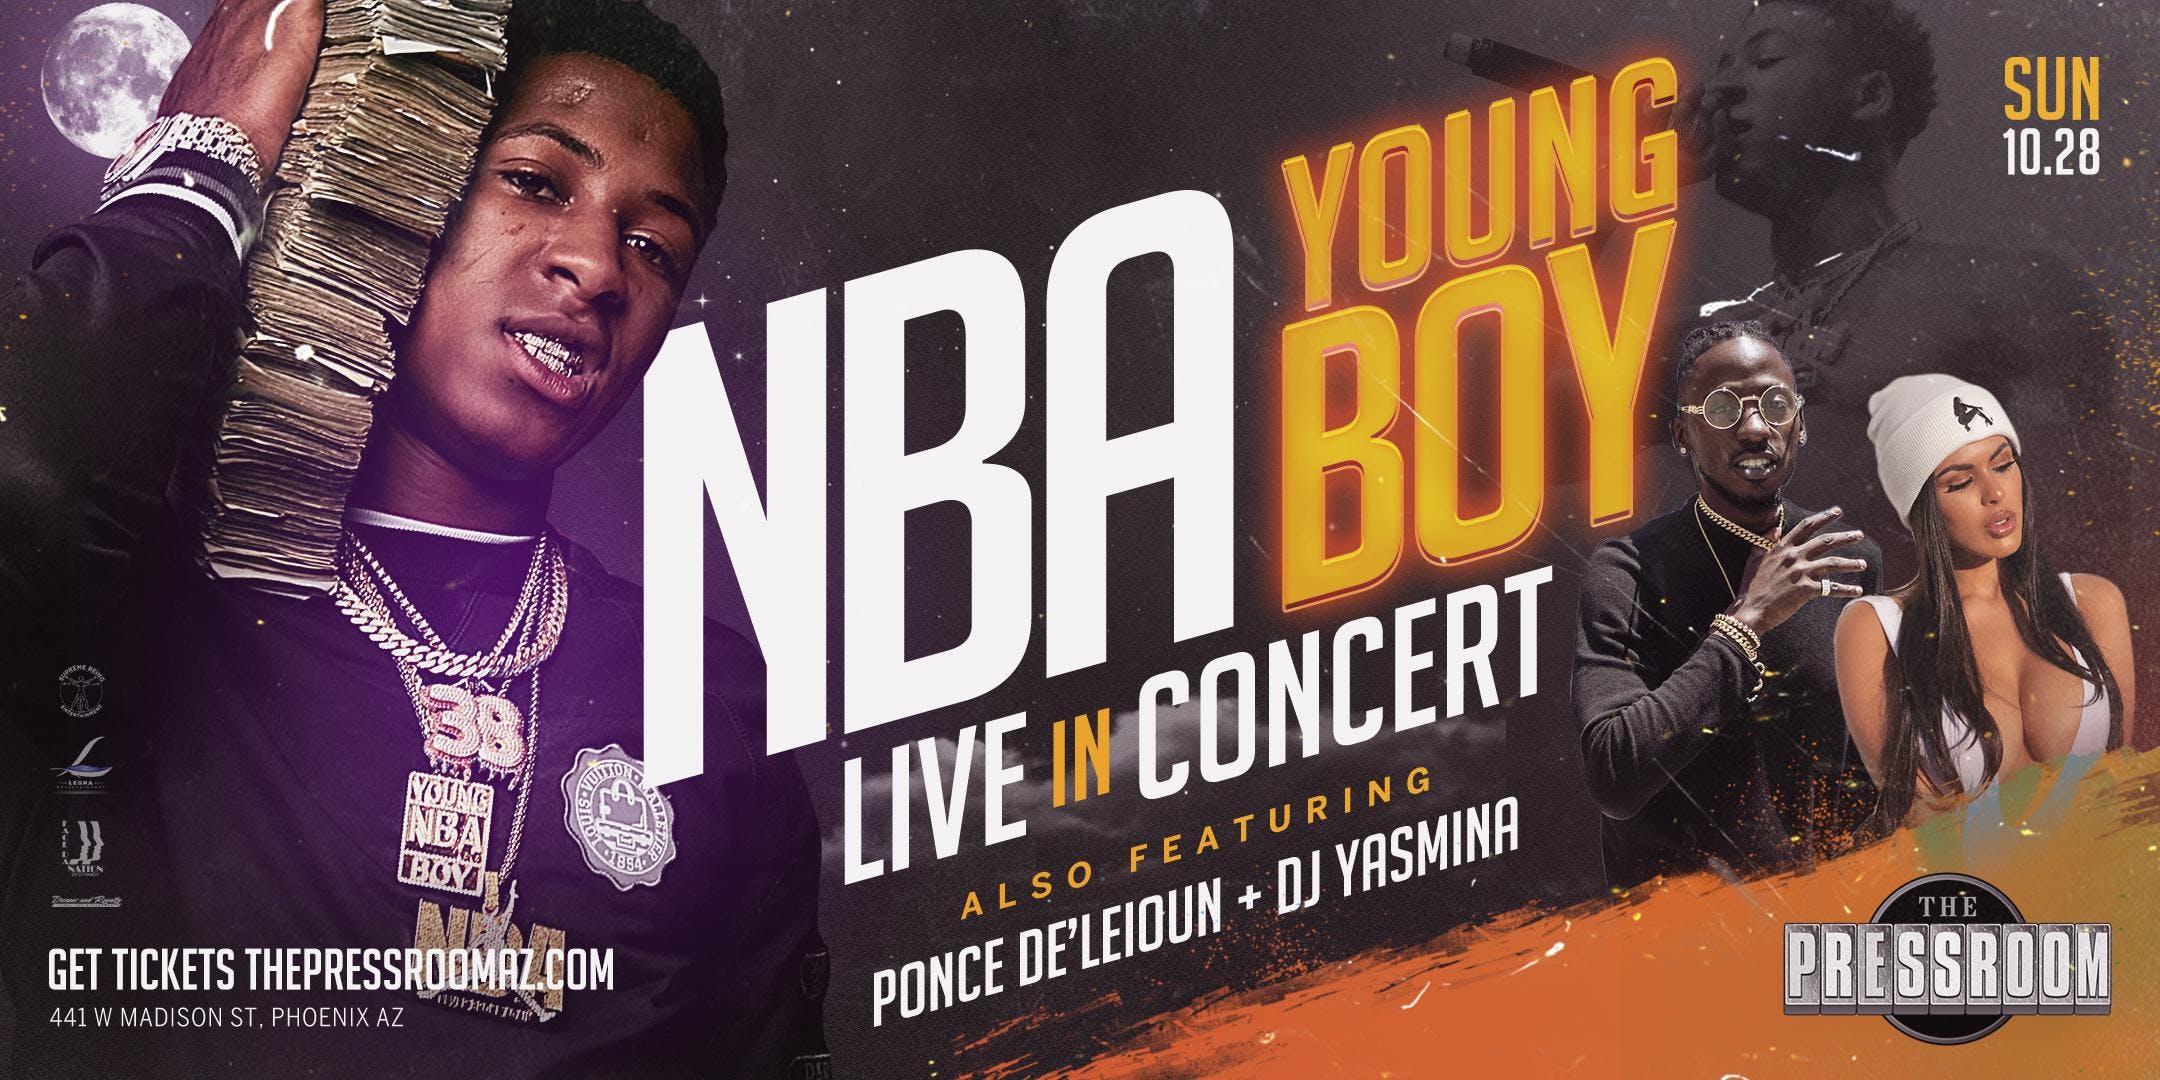 NBA YoungBoy @ The Pressroom